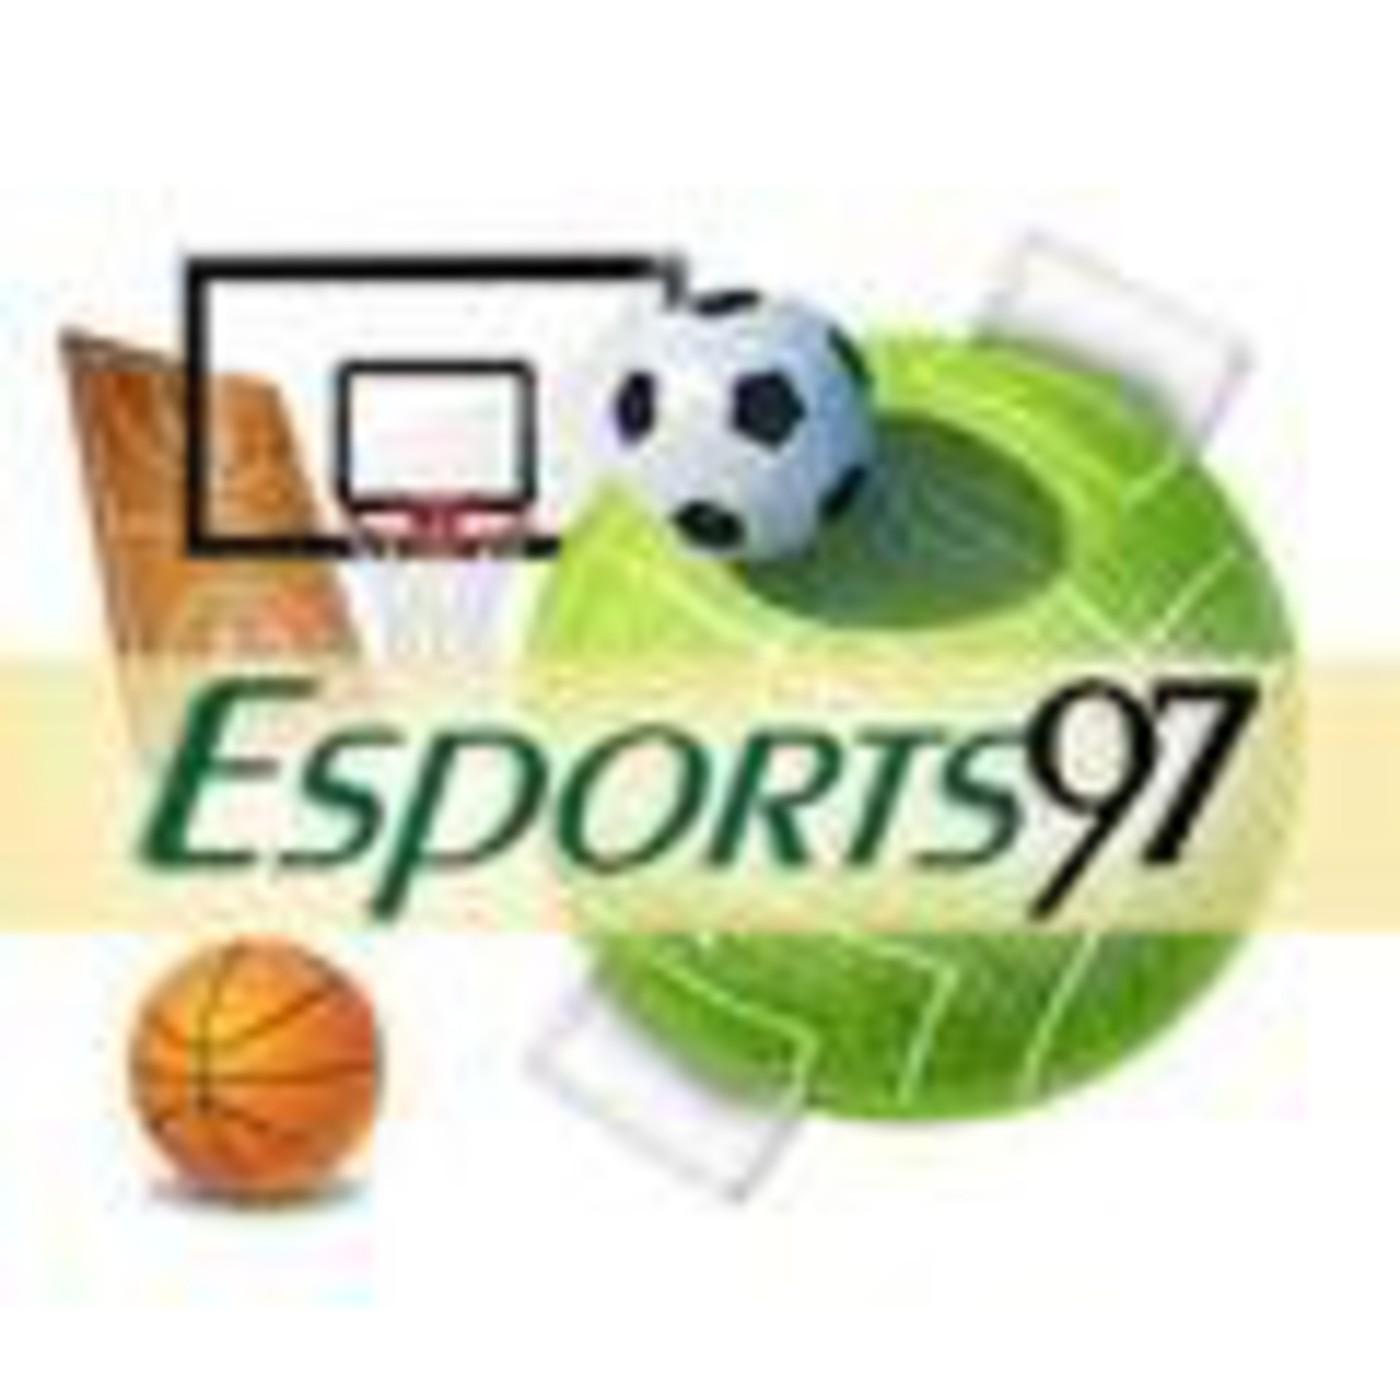 Esports97